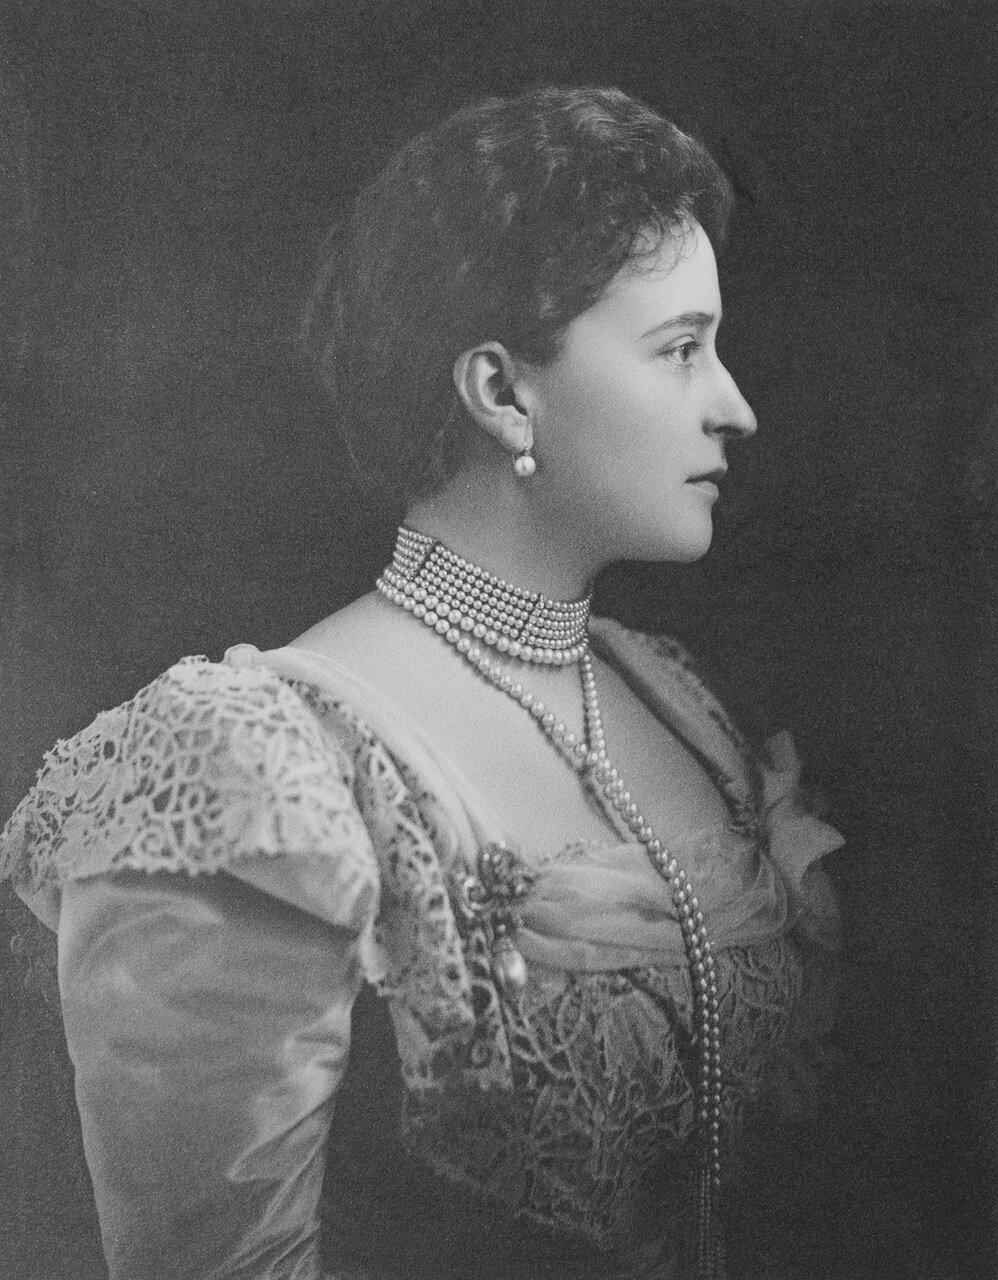 Великая княгиня Елизавета Федоровна, 1899 г.